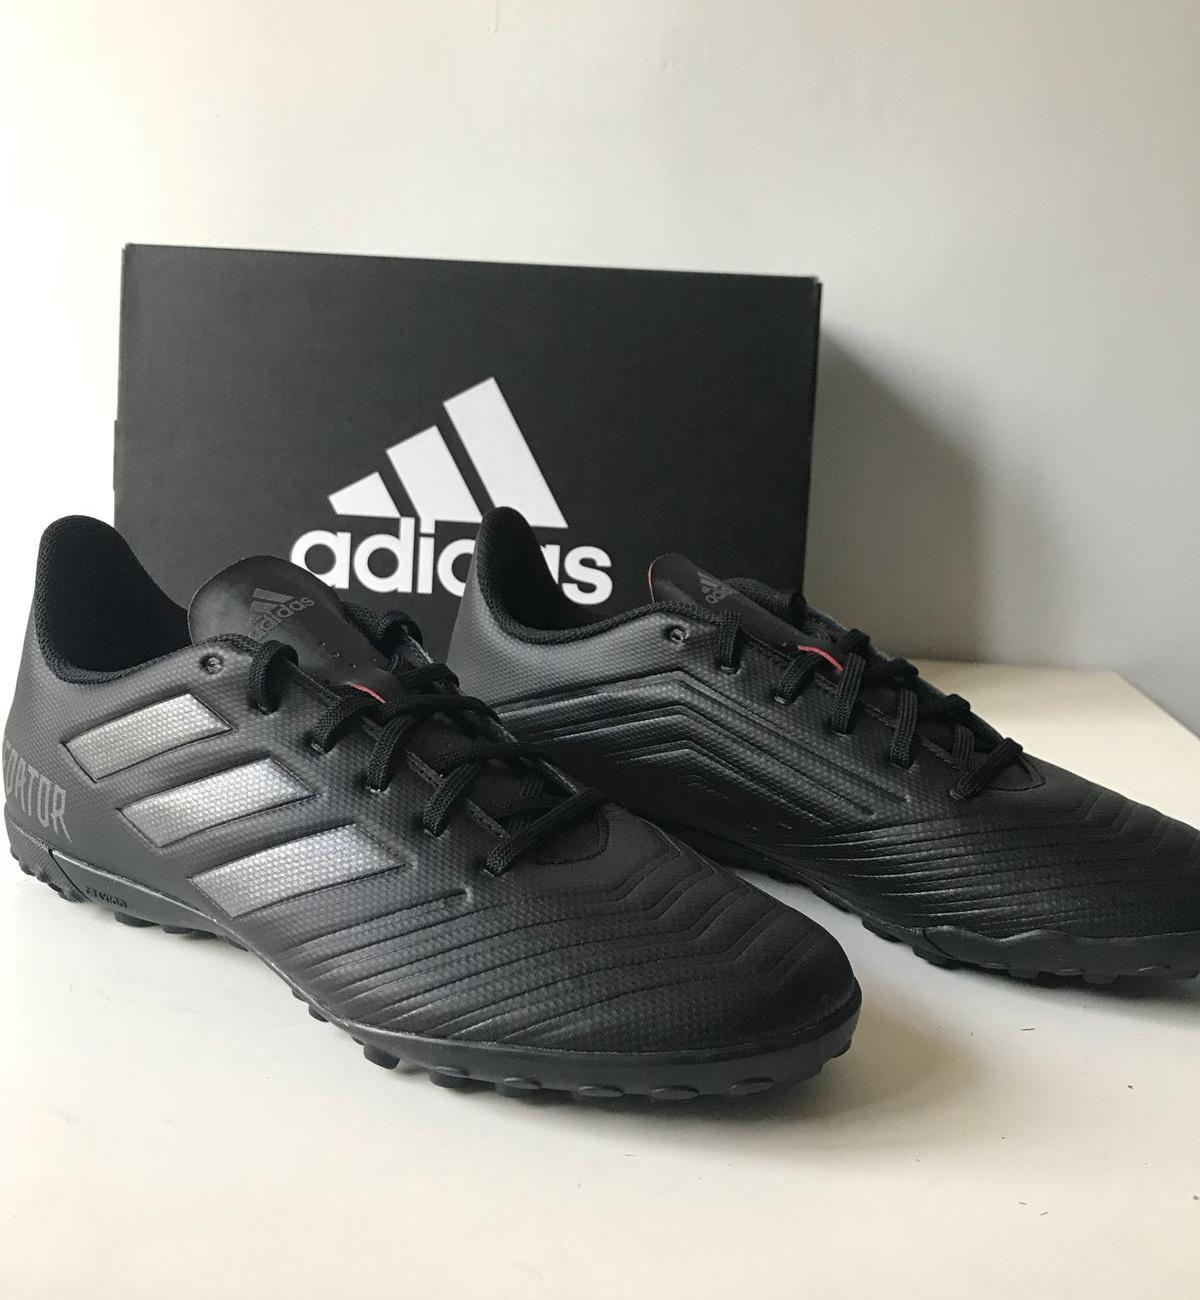 Football shoes Adidas Predator Tango 18.4 Noir Five-a-side-football ... 9c9ab57e5fb5c